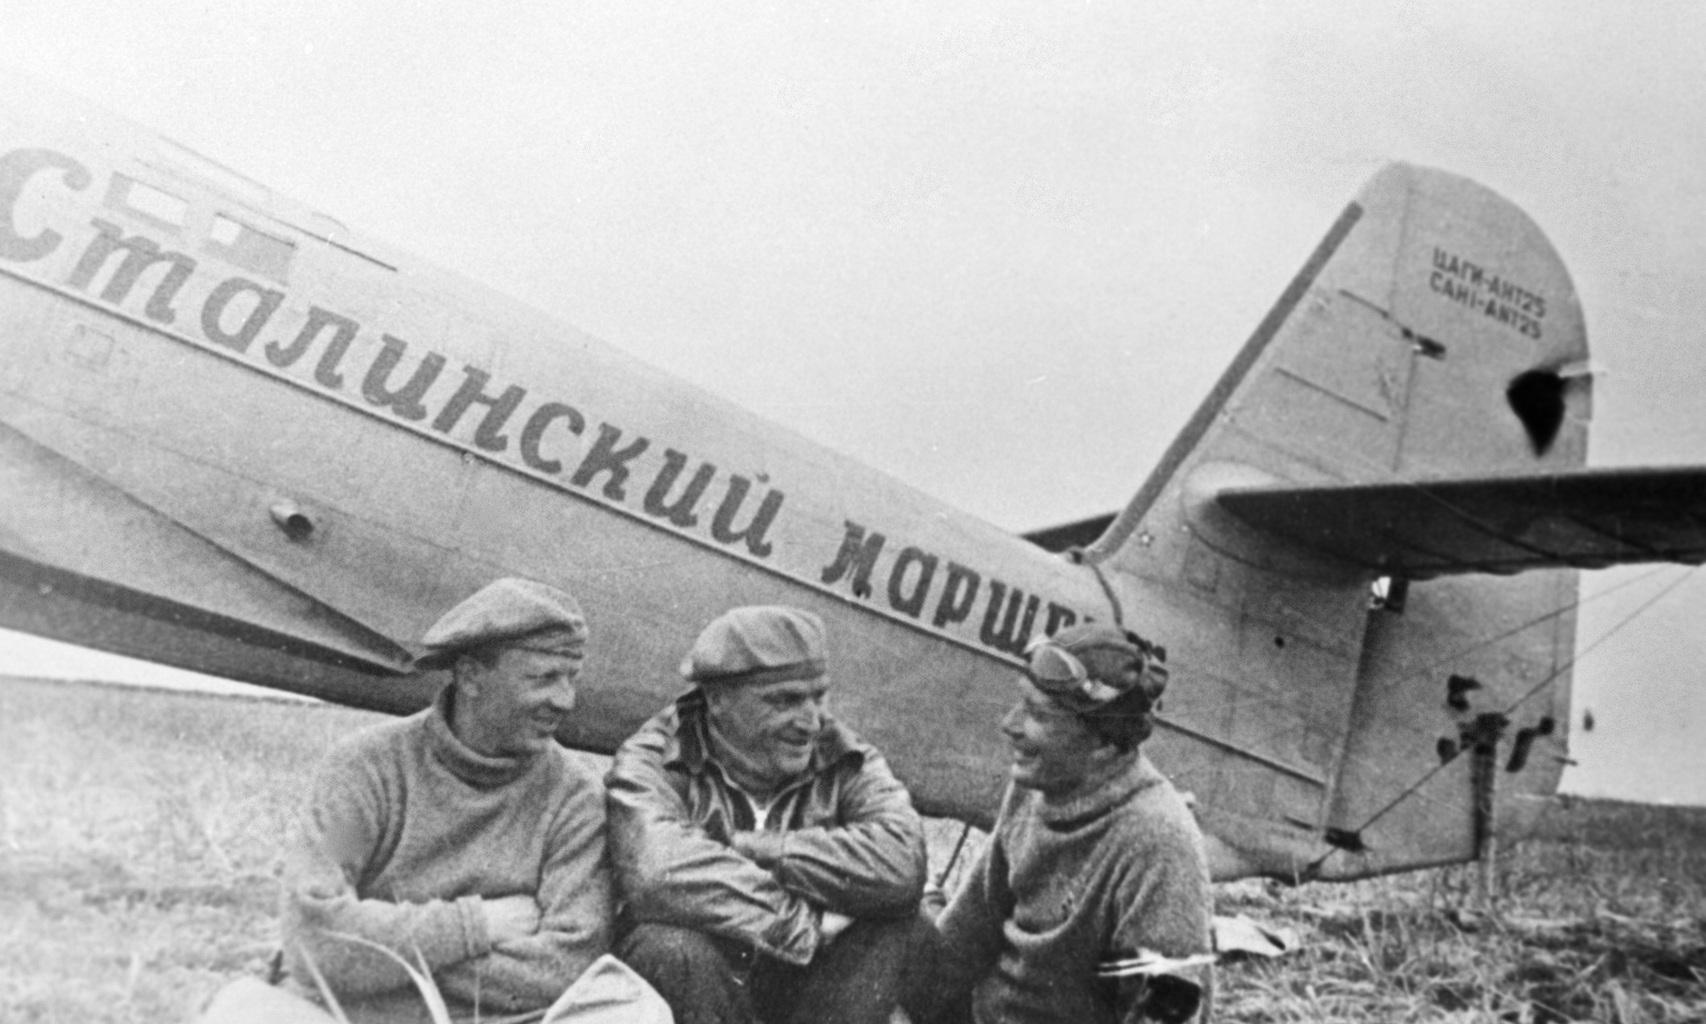 Bajdukov, Cskalov és Beljakov #moszkvater